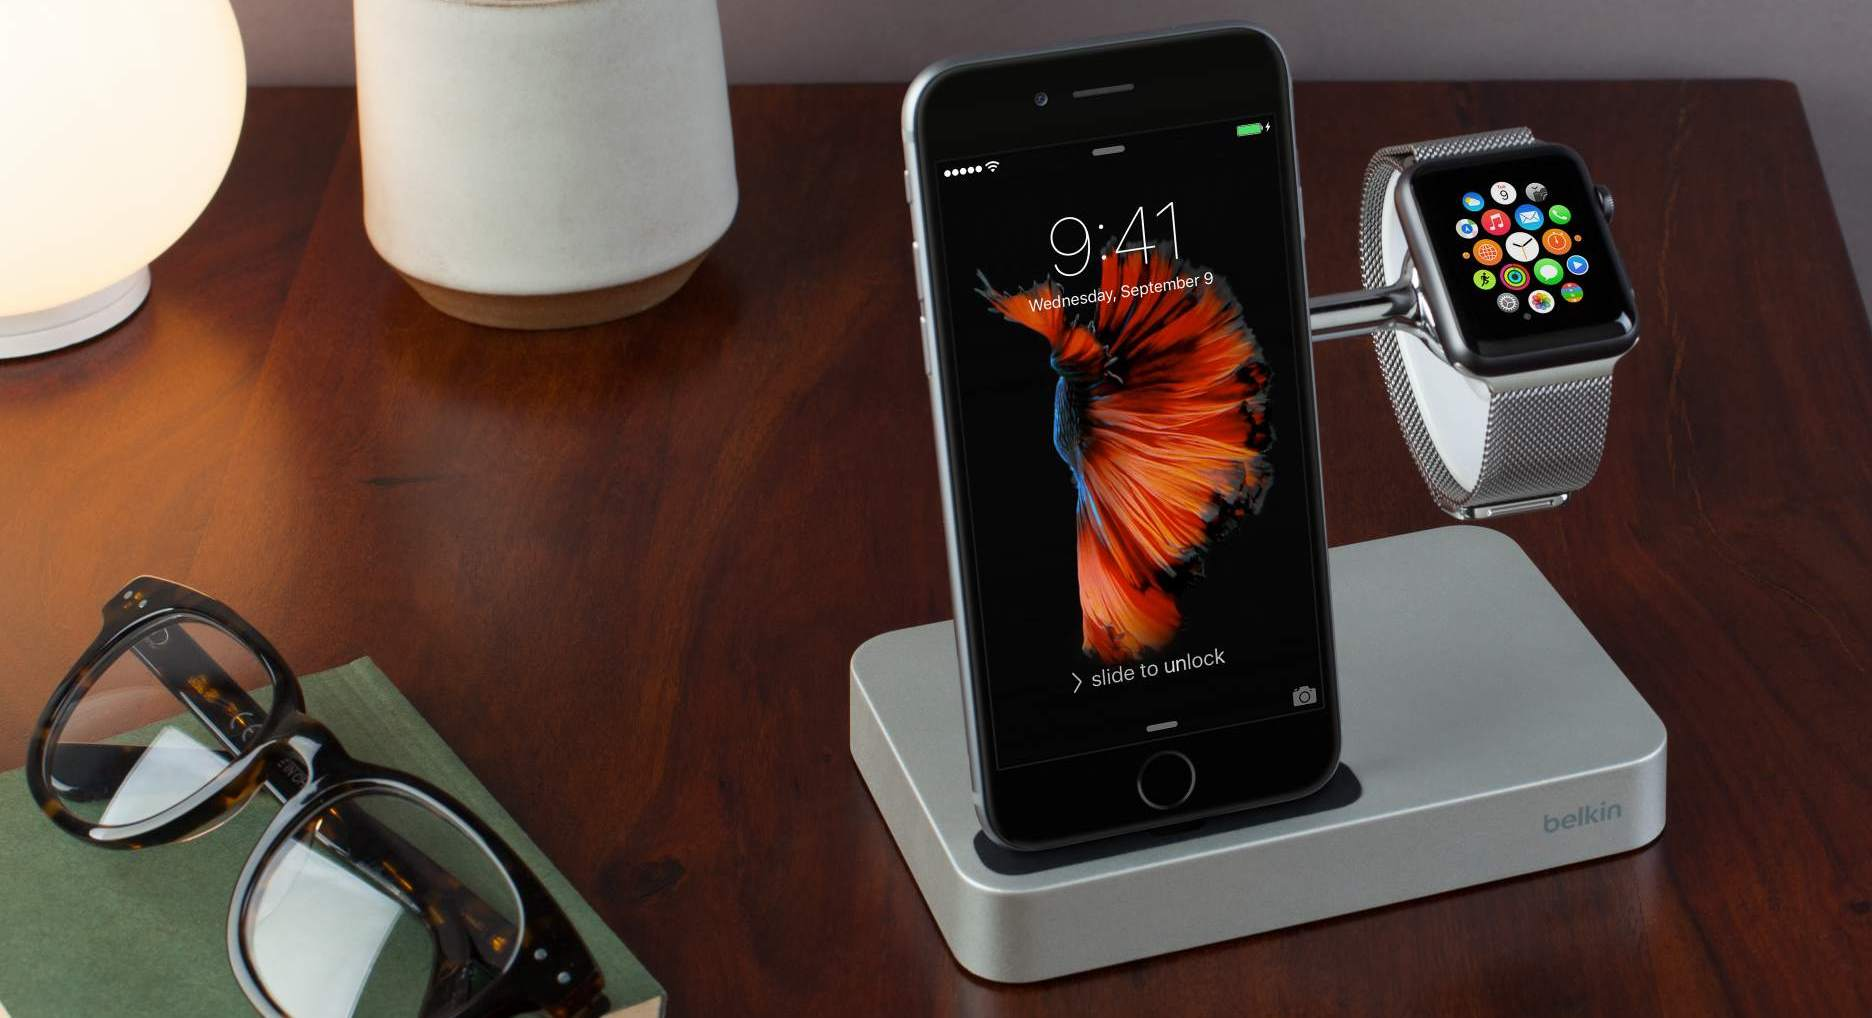 Зарядная док-станция Belkin Watch Valet Charge Dock для Apple Watch и iPhone.